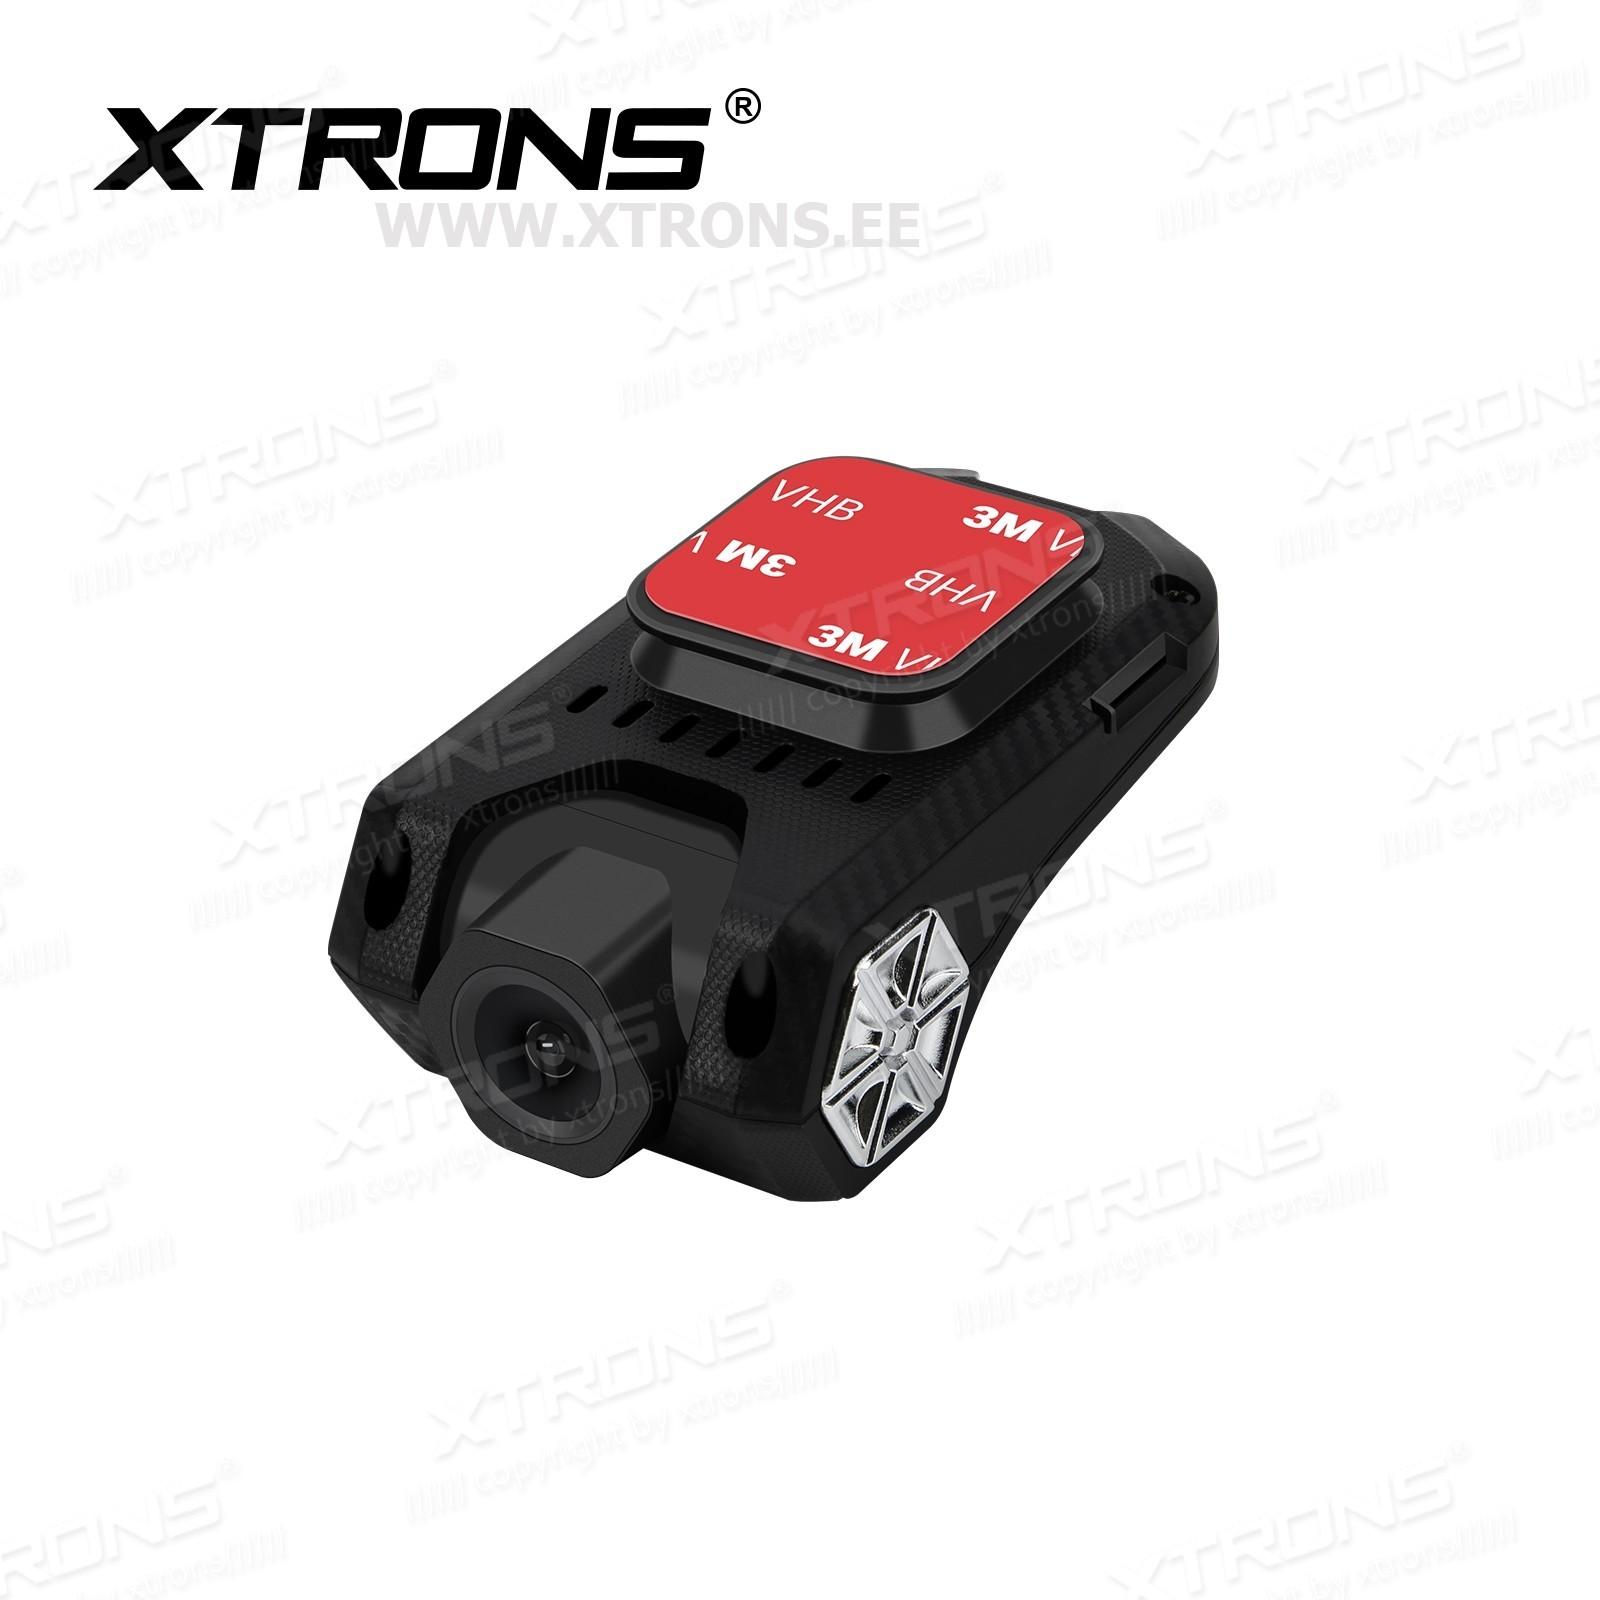 XTRONS DVR029